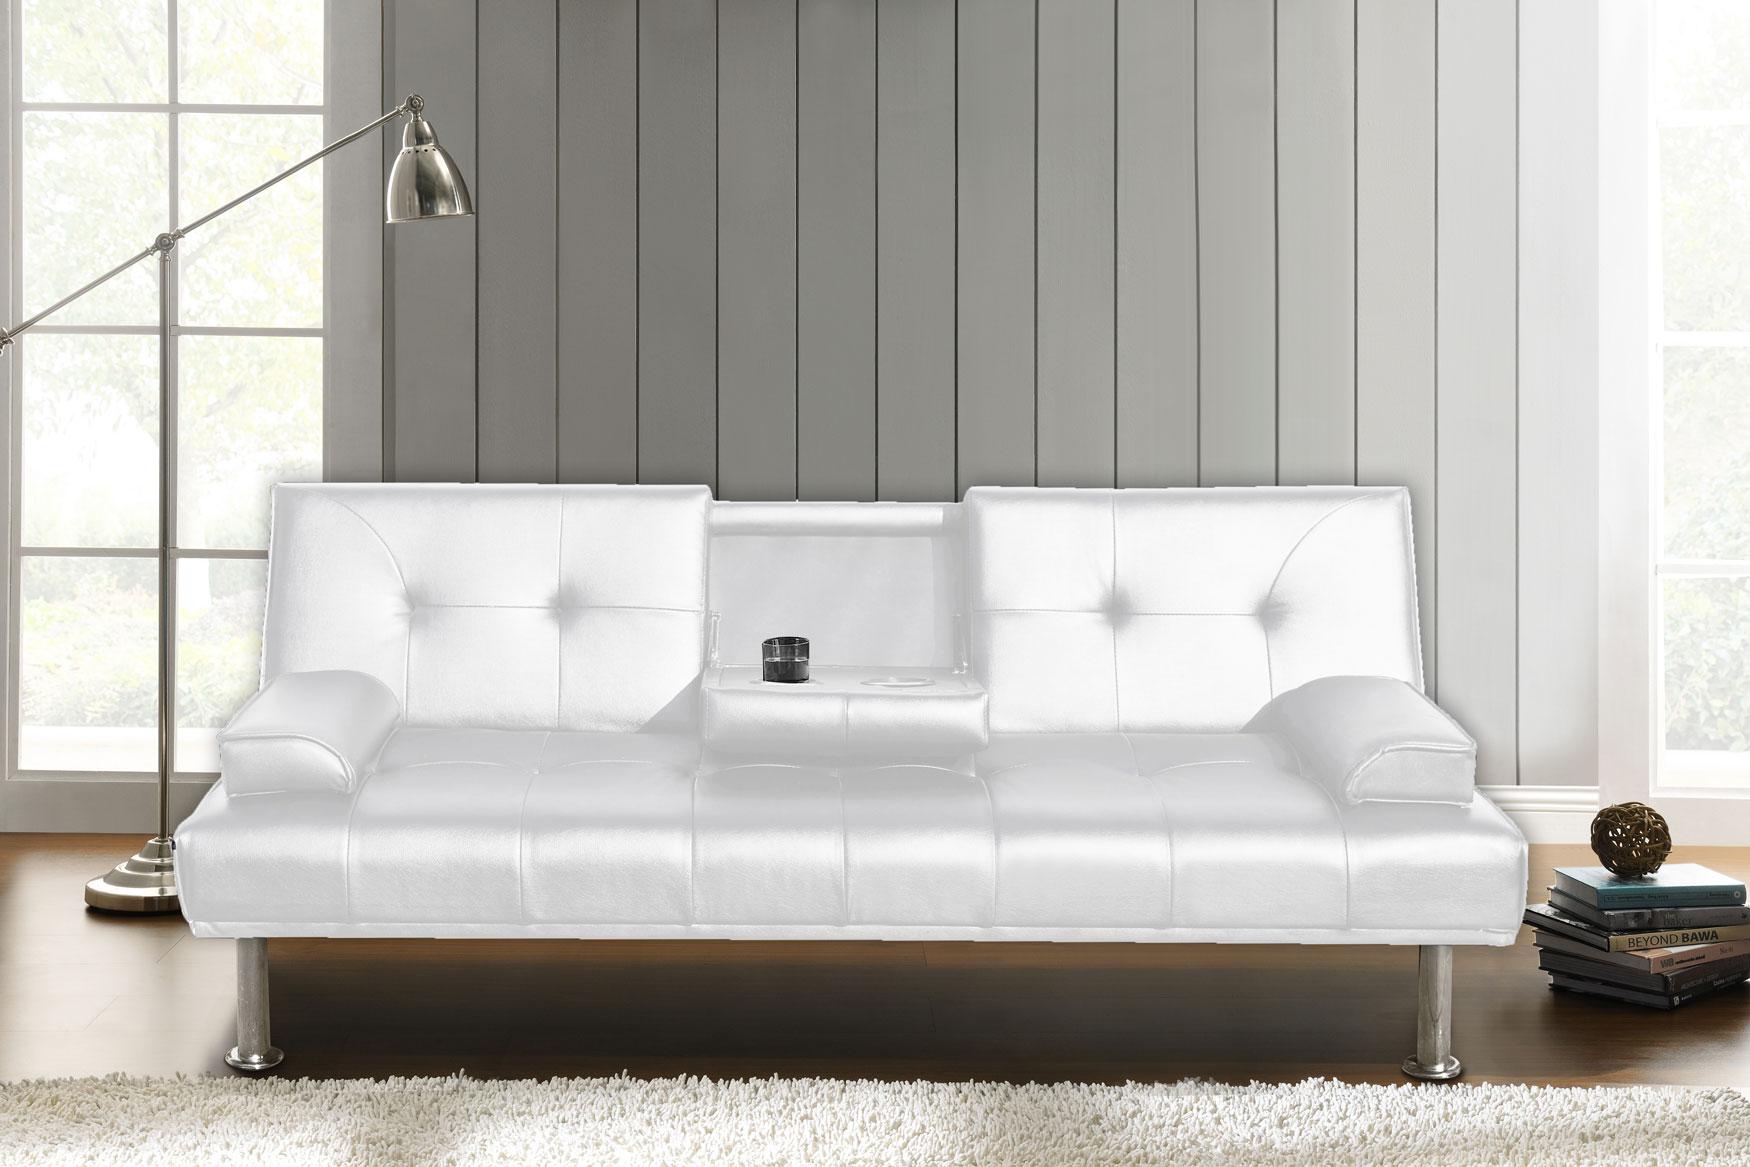 sofa schlafsofa dubai klappsofa kunstleder couch schlafcouch klappcouch garnitur ebay. Black Bedroom Furniture Sets. Home Design Ideas